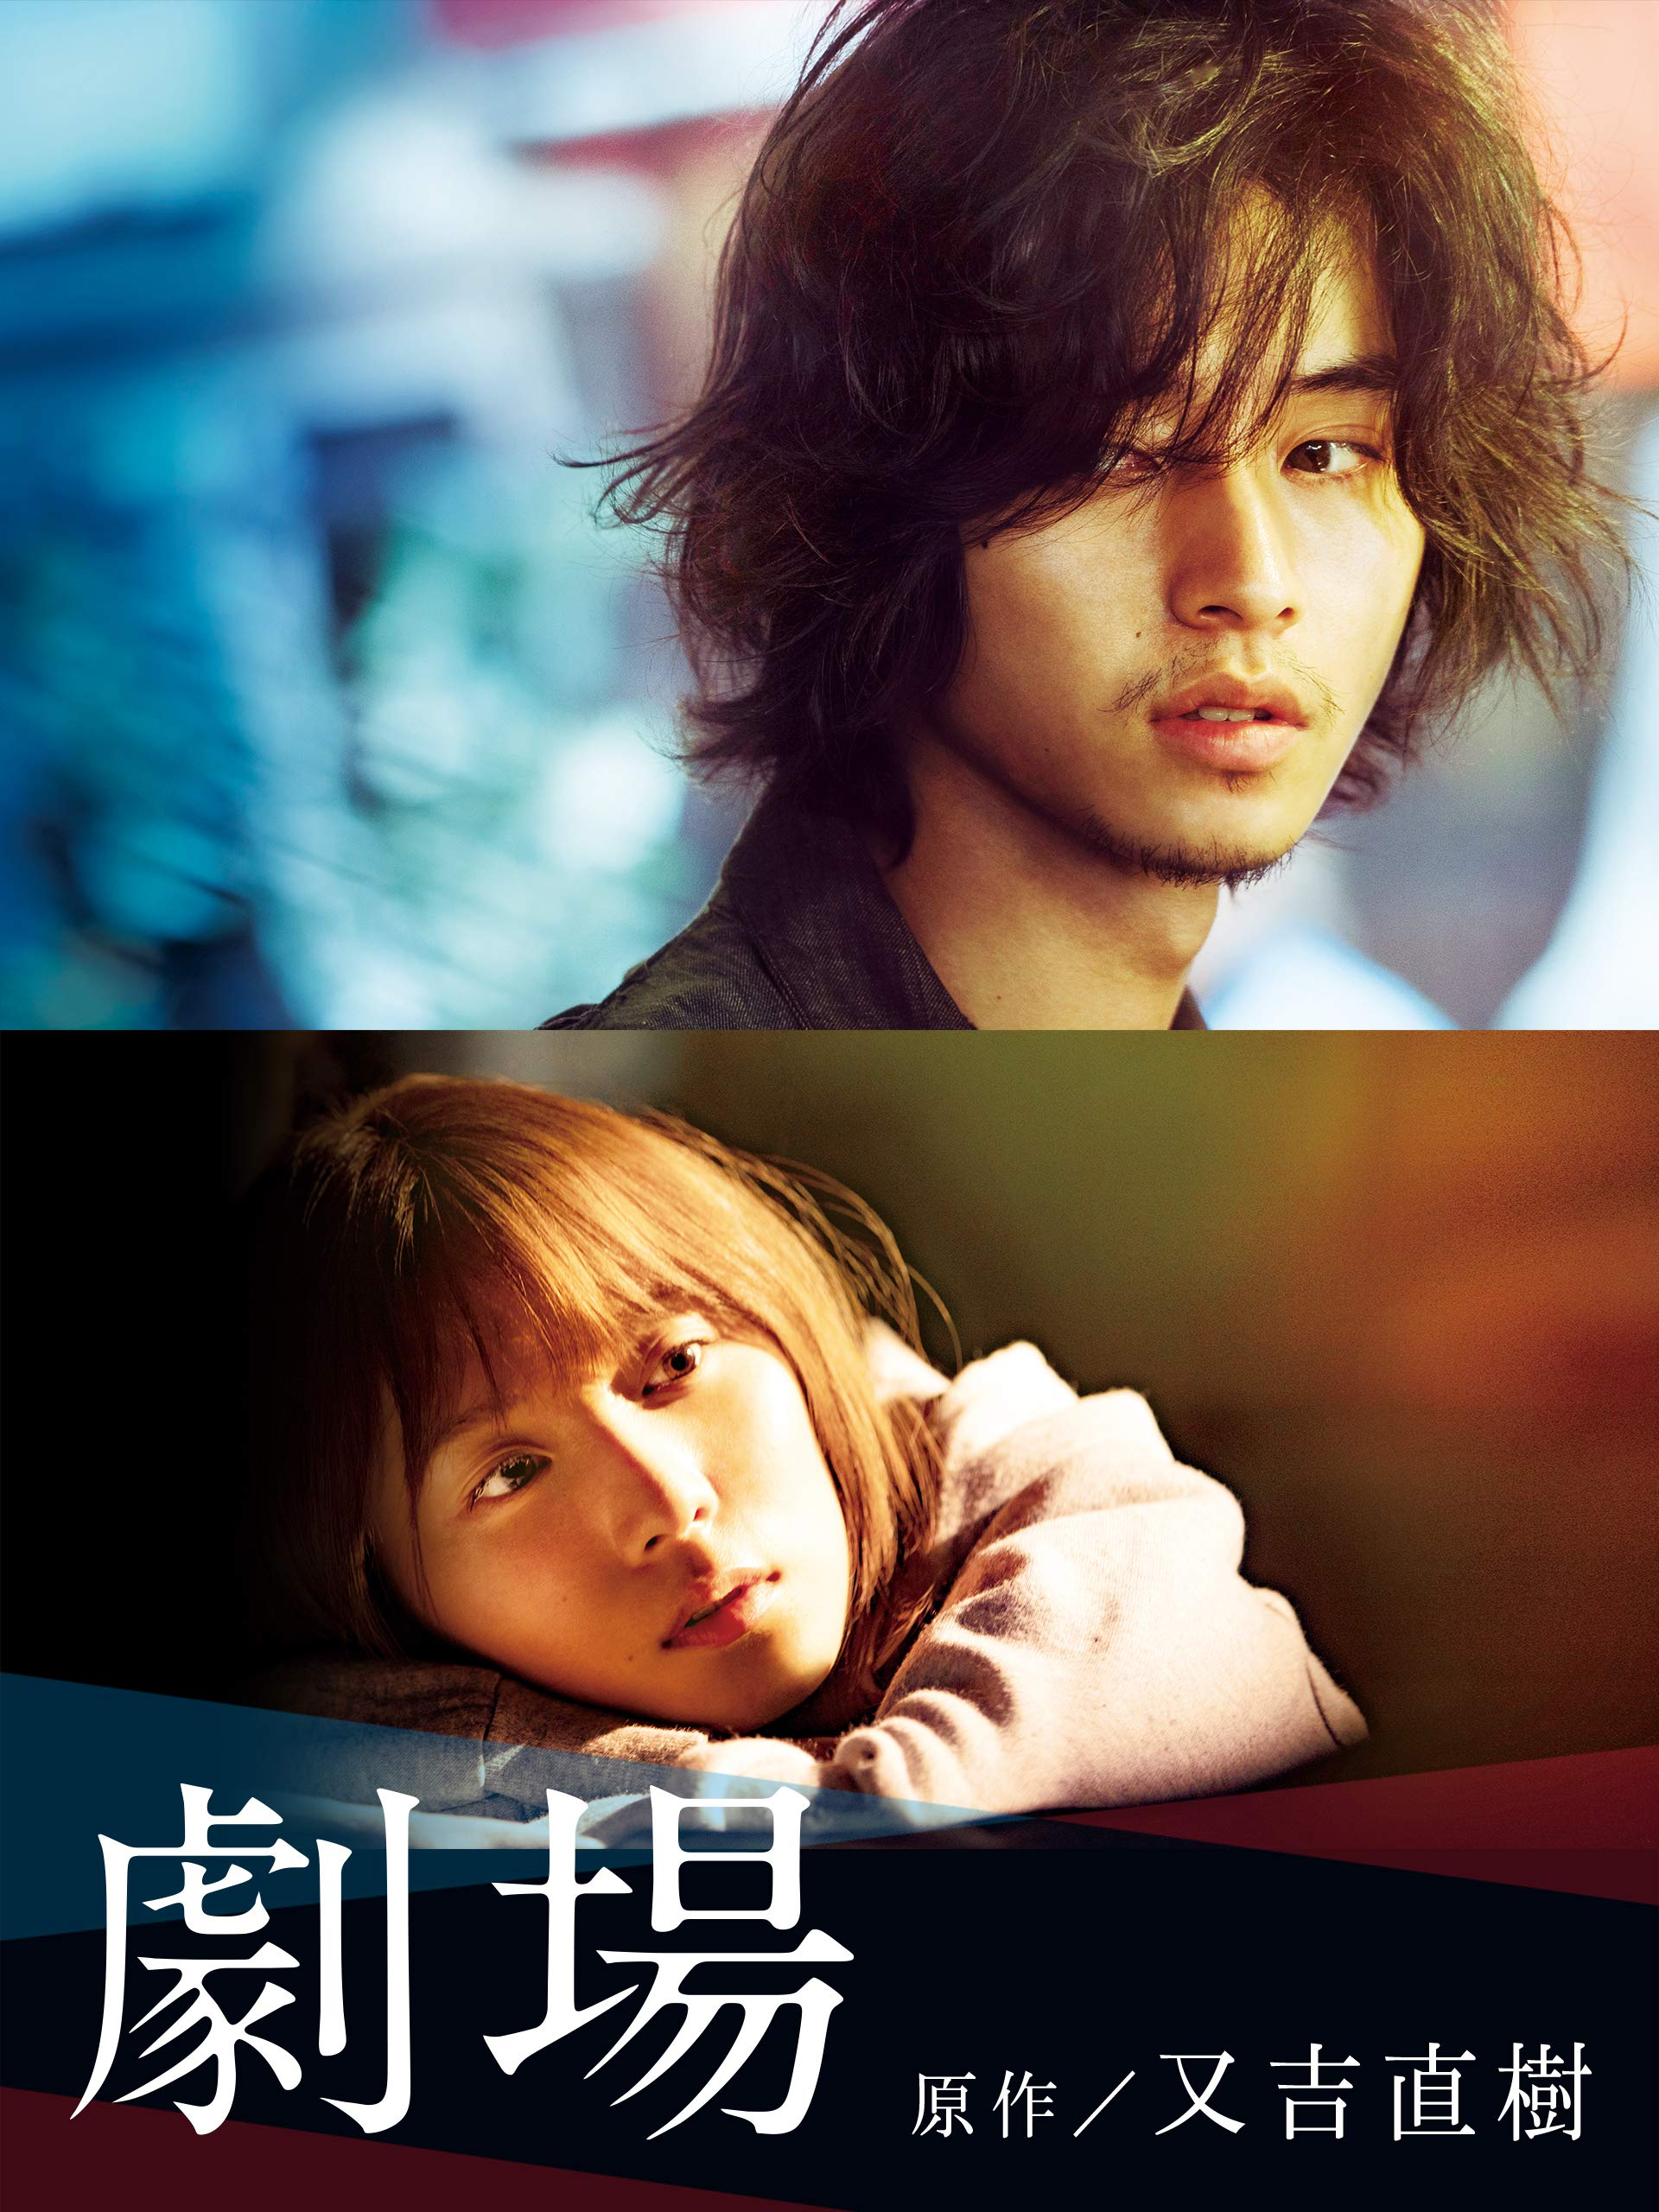 Amazon.co.jp: 劇場を観る | Prime Video